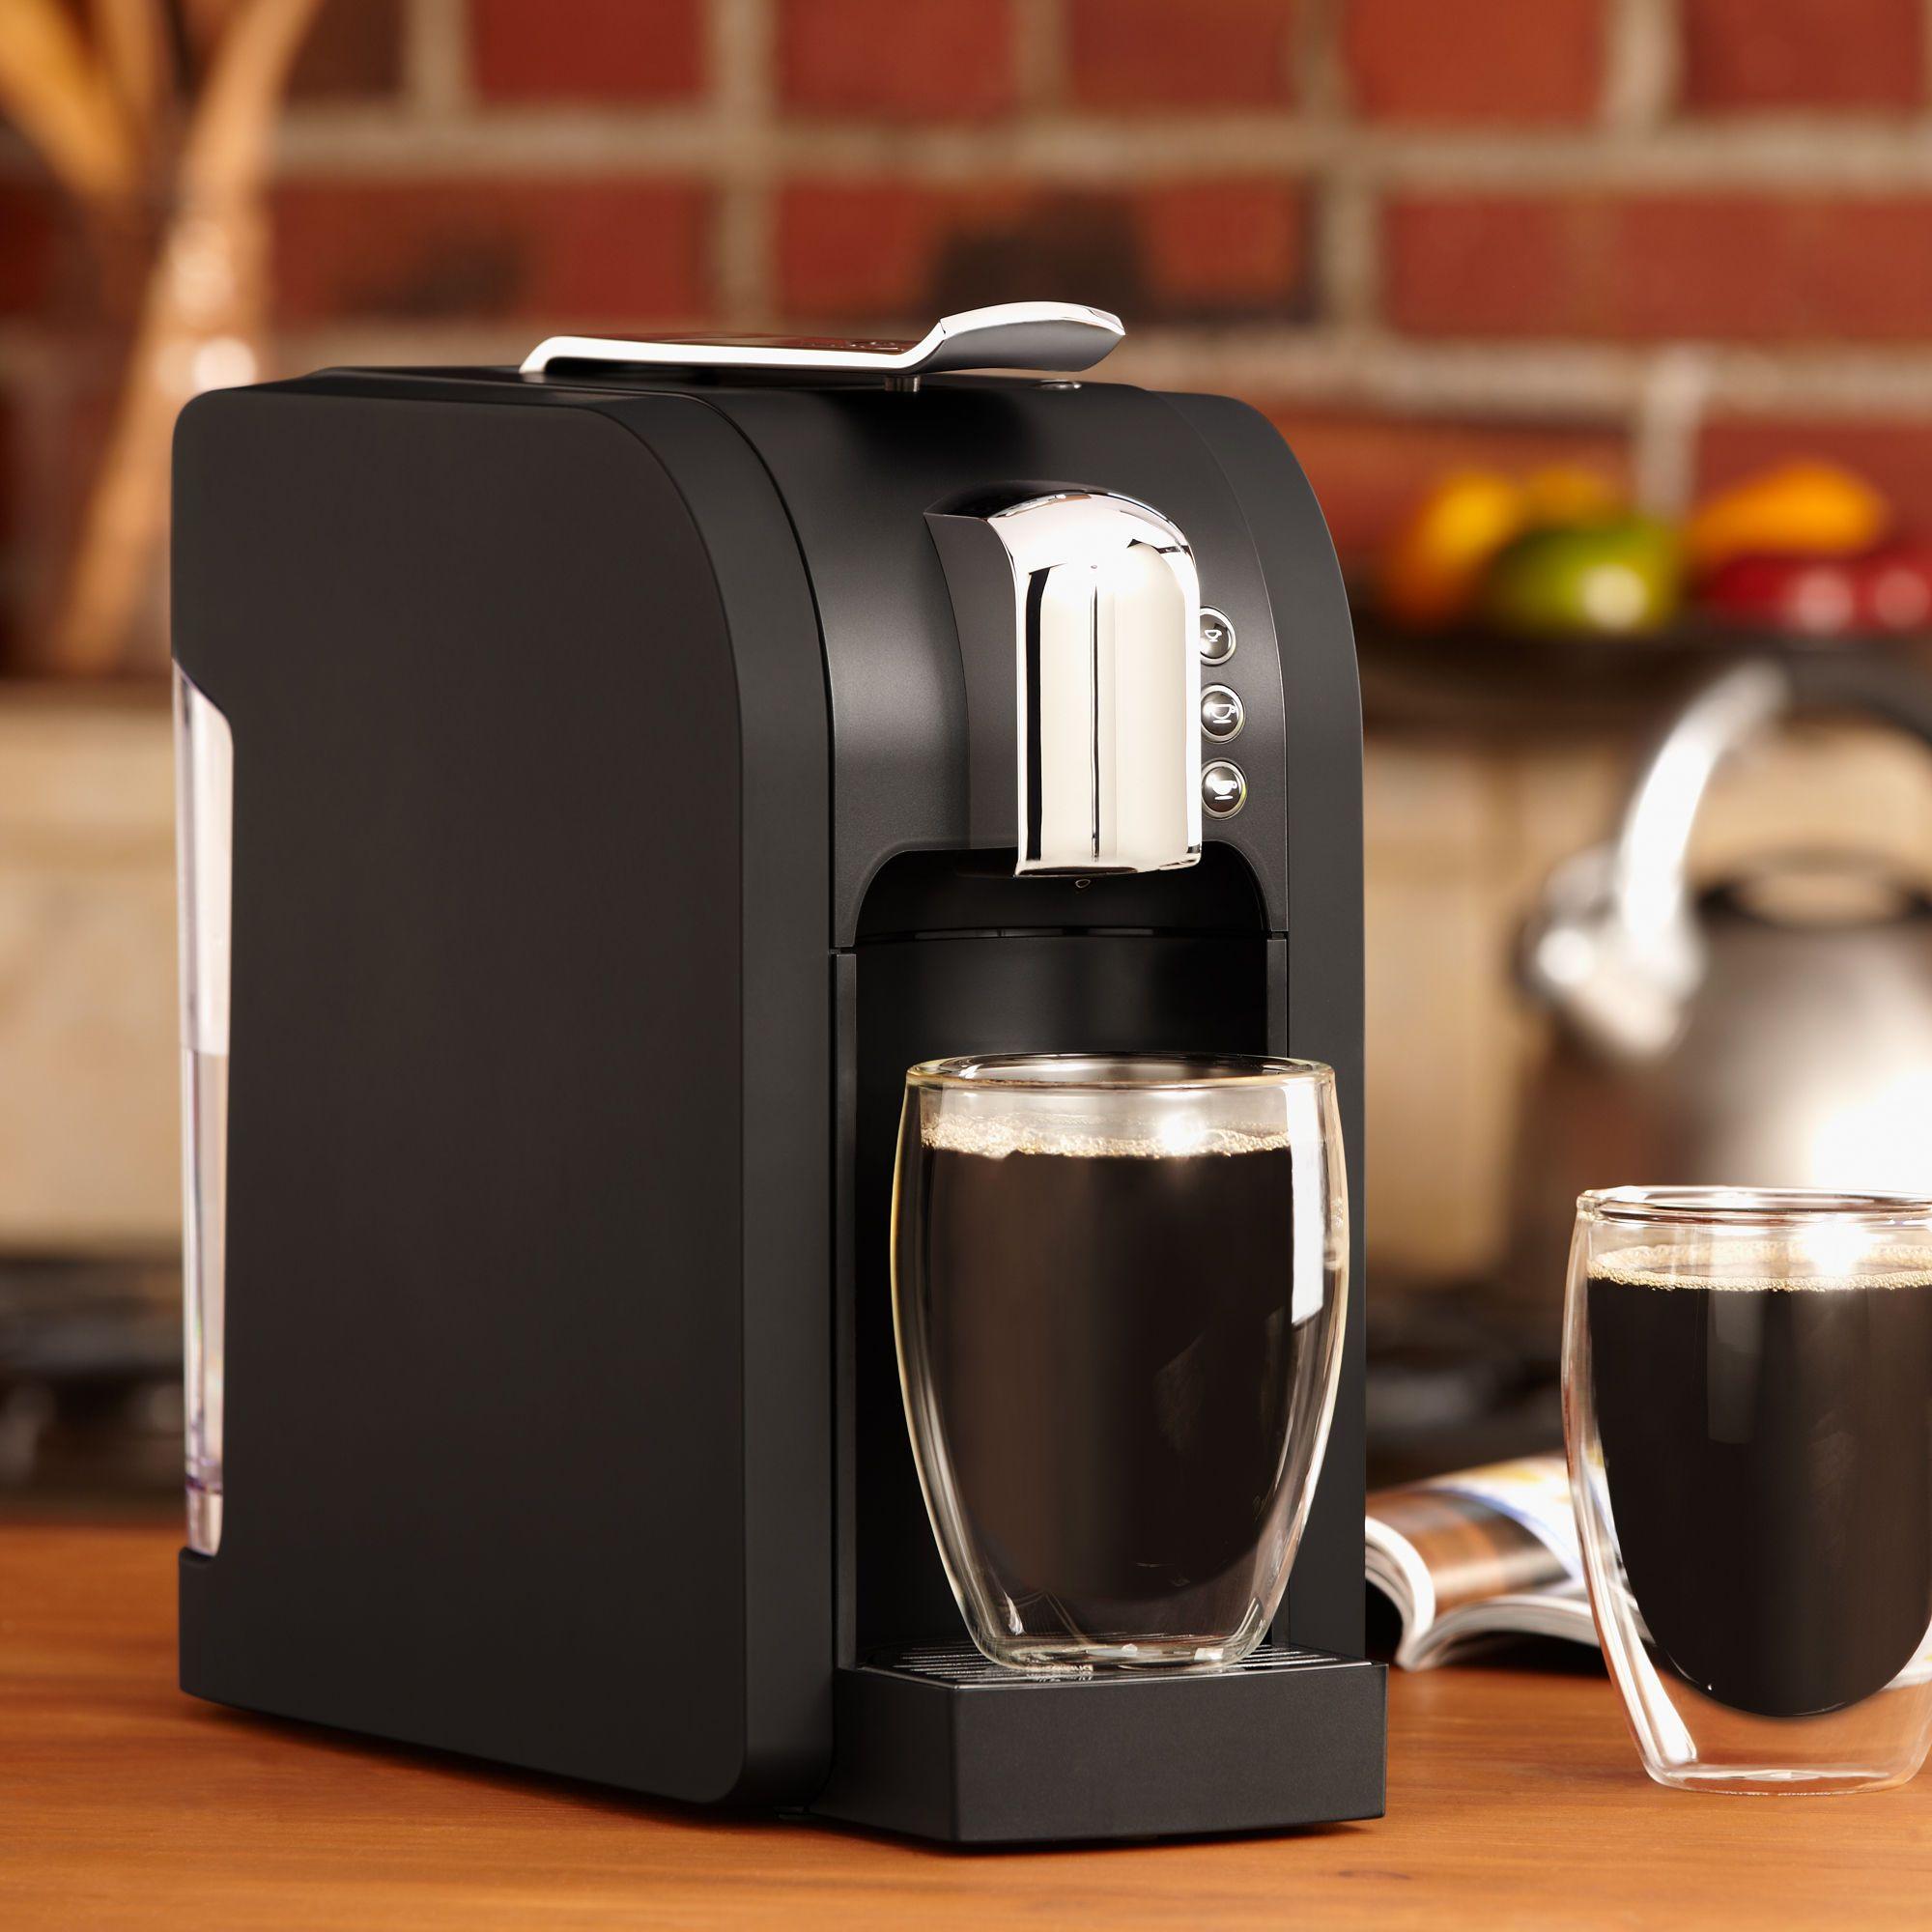 Starbucks Verismo Brewer System Cafe Starbucks Coffee